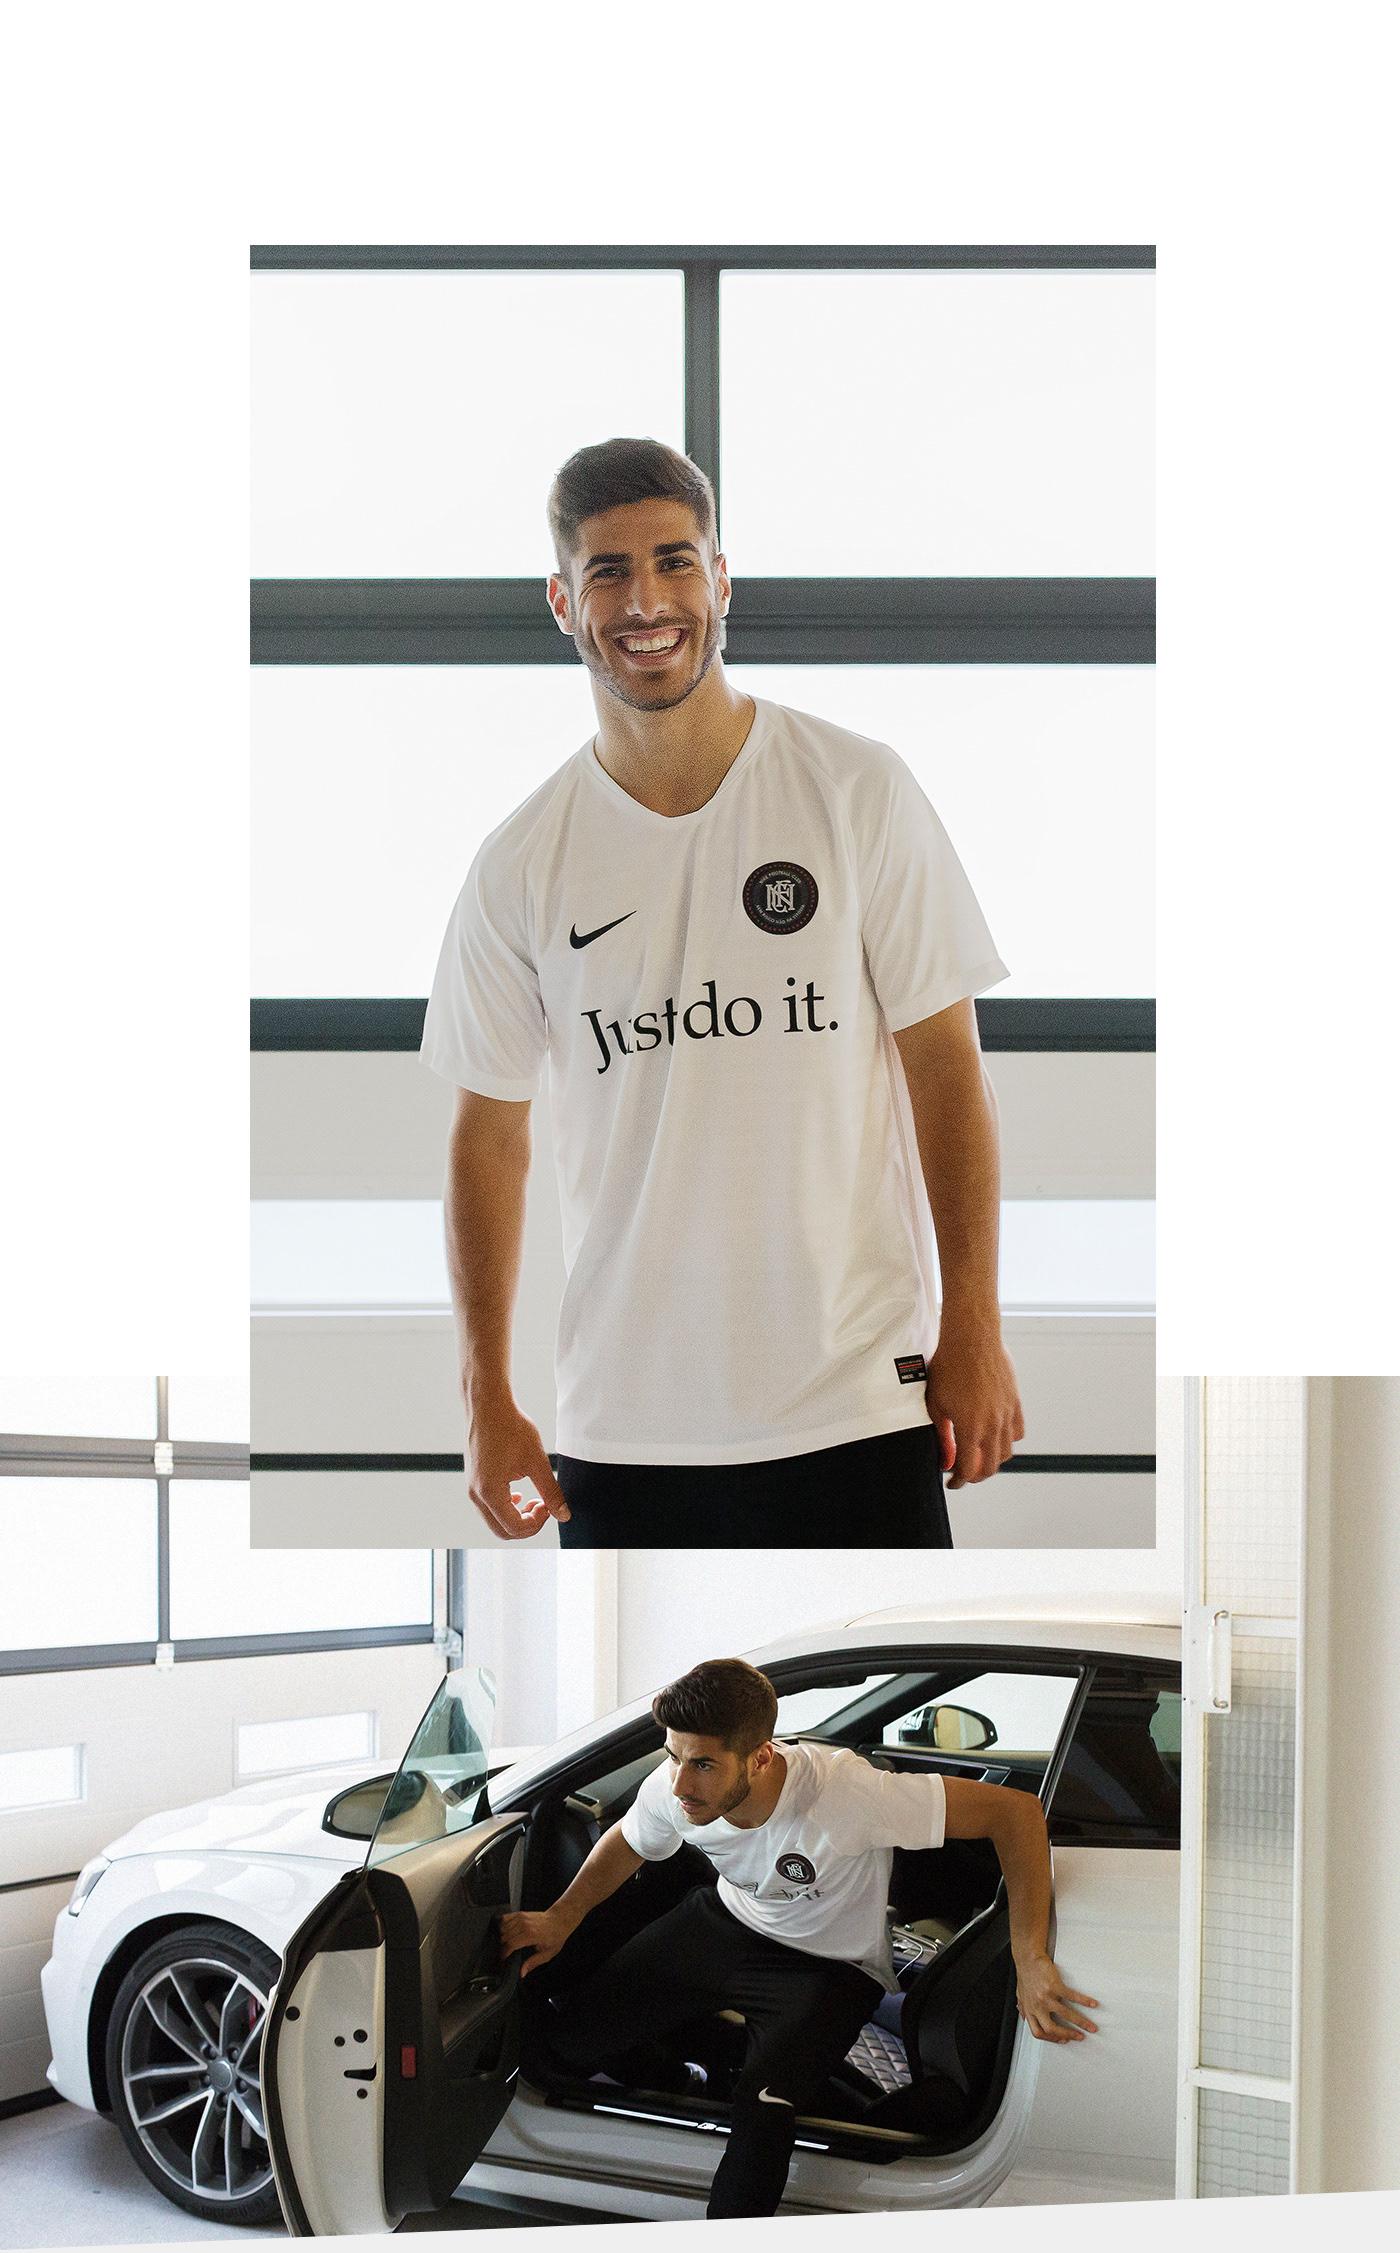 Nike FC portrait marco asensio photo football just do it photoshoot free madrid